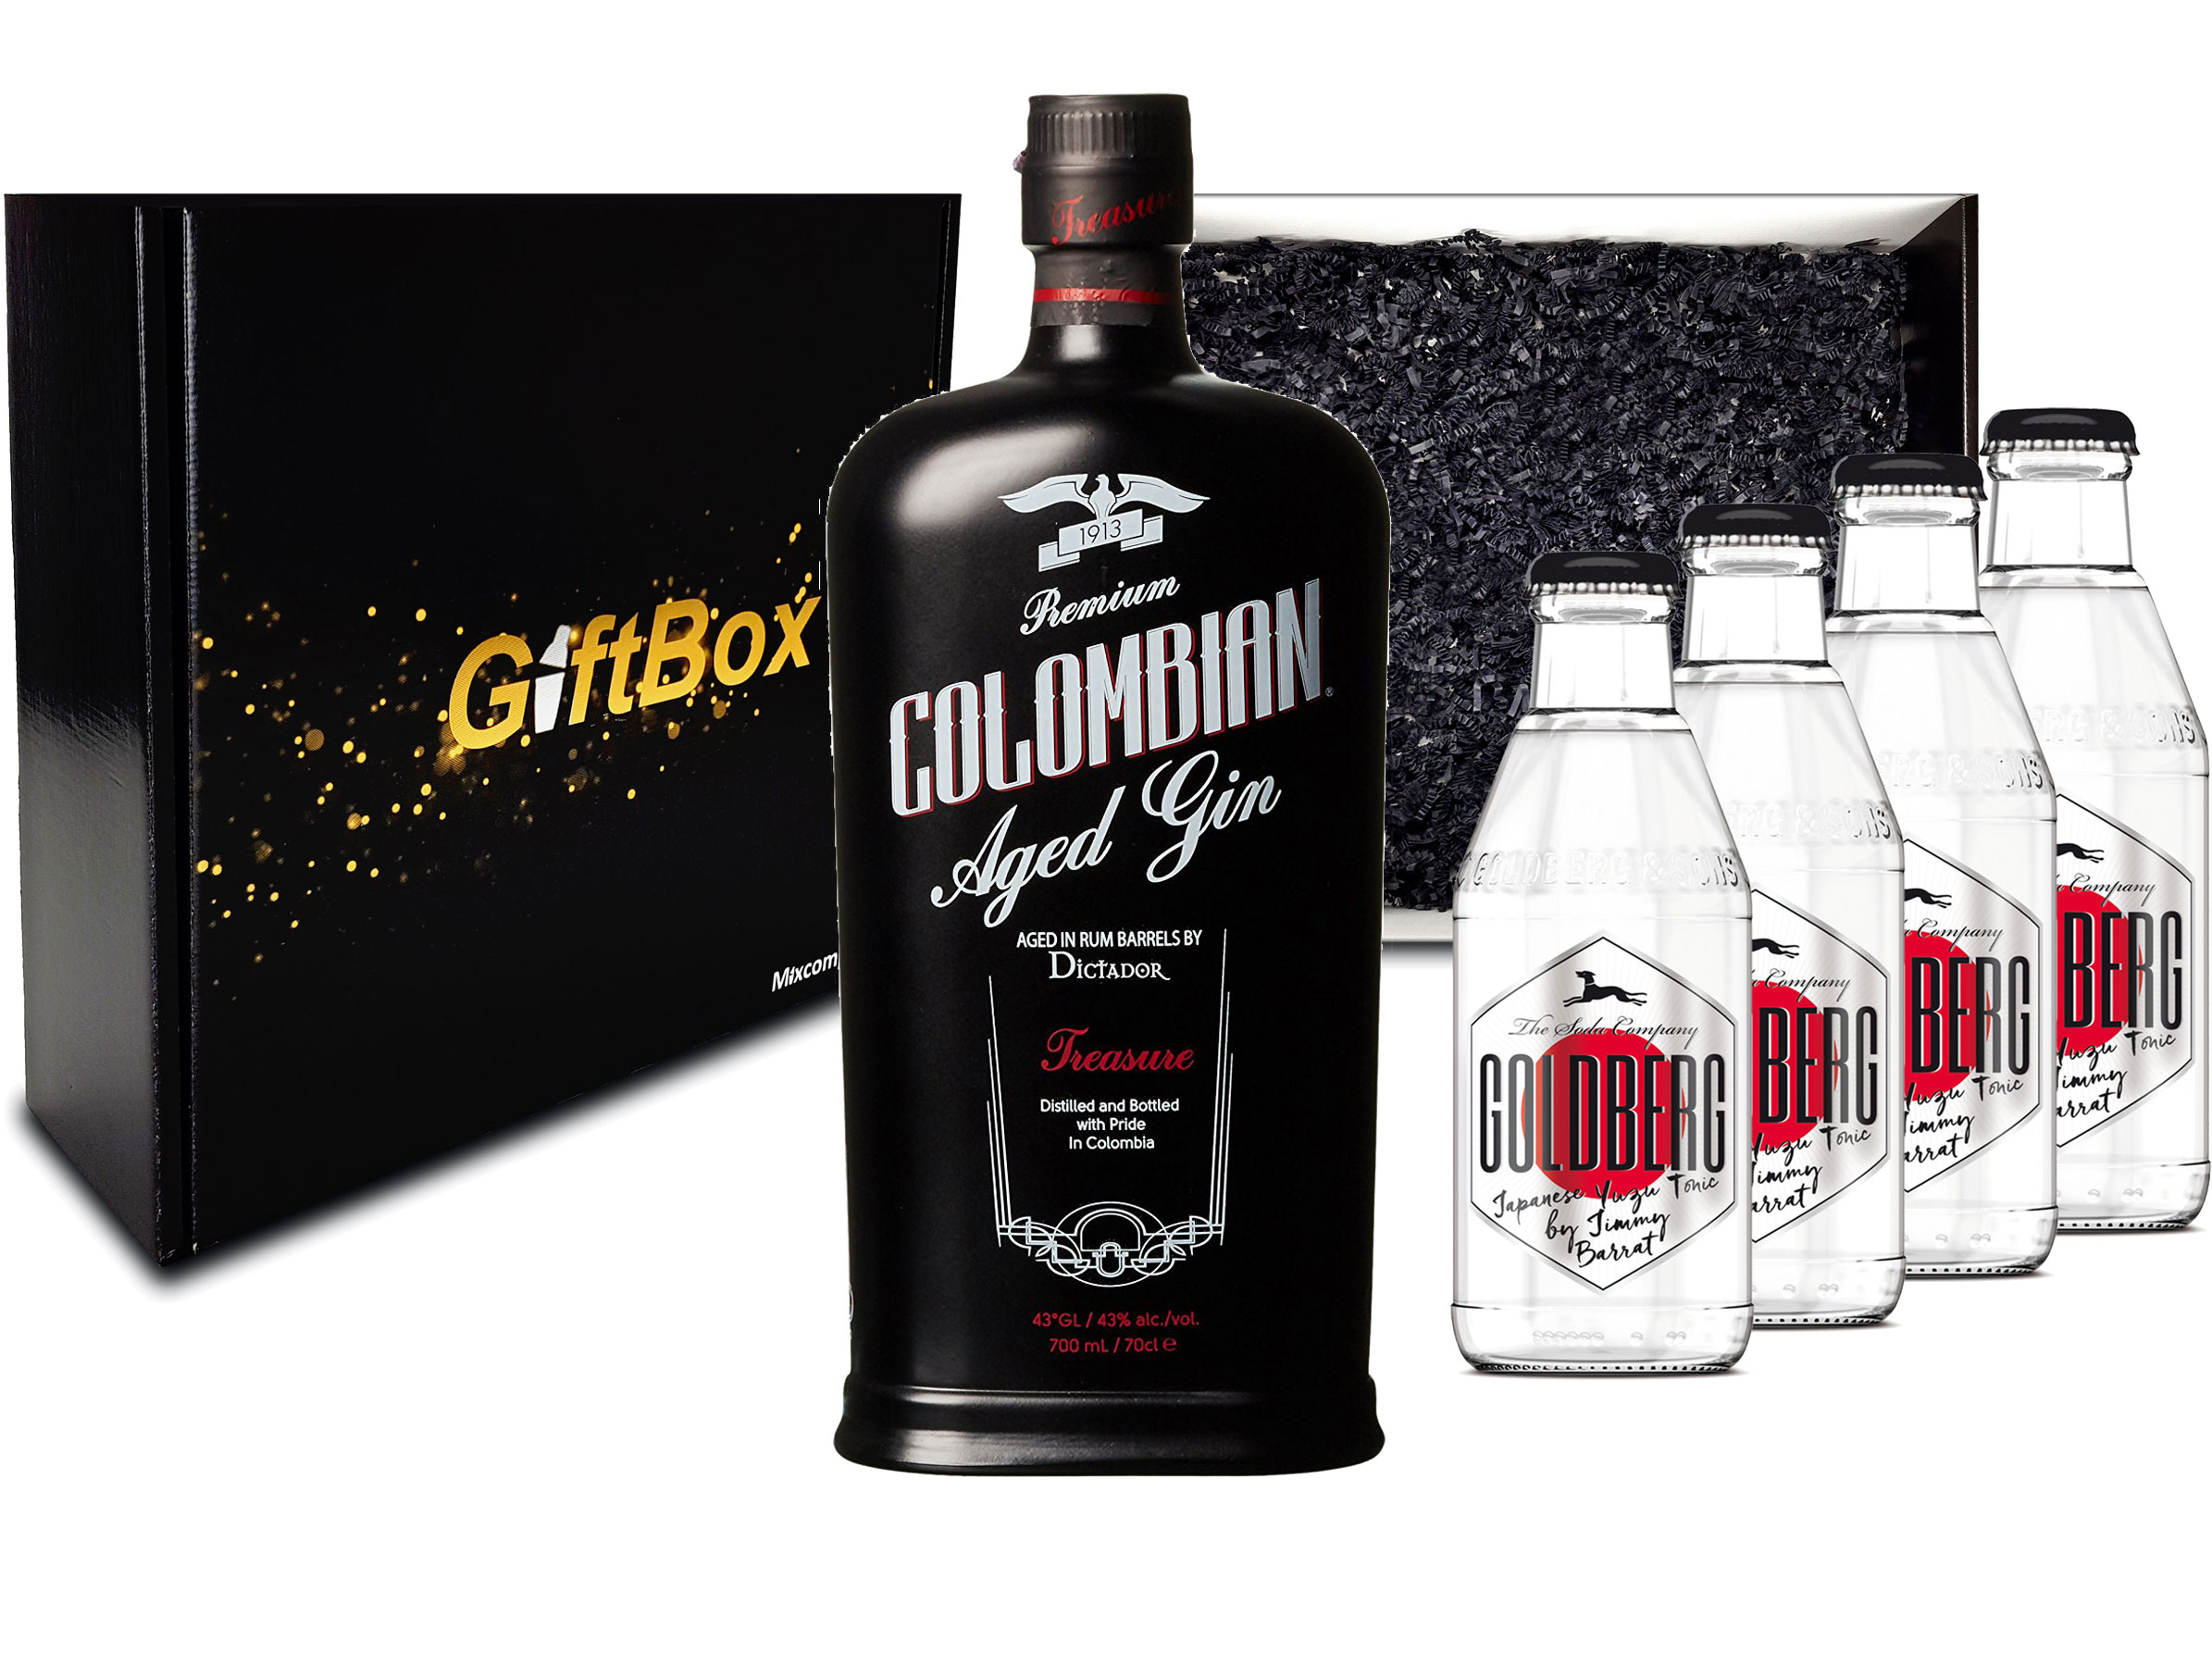 Gin Tonic Set Giftbox Geschenkset - Dictador Premium Colombian Aged Gin 0,7l 700ml (43% Vol) + 4x Goldberg Japanese Yuzu Tonic Water 200ml inkl. Pfand MEHRWEG -[Enthält Sulfite]